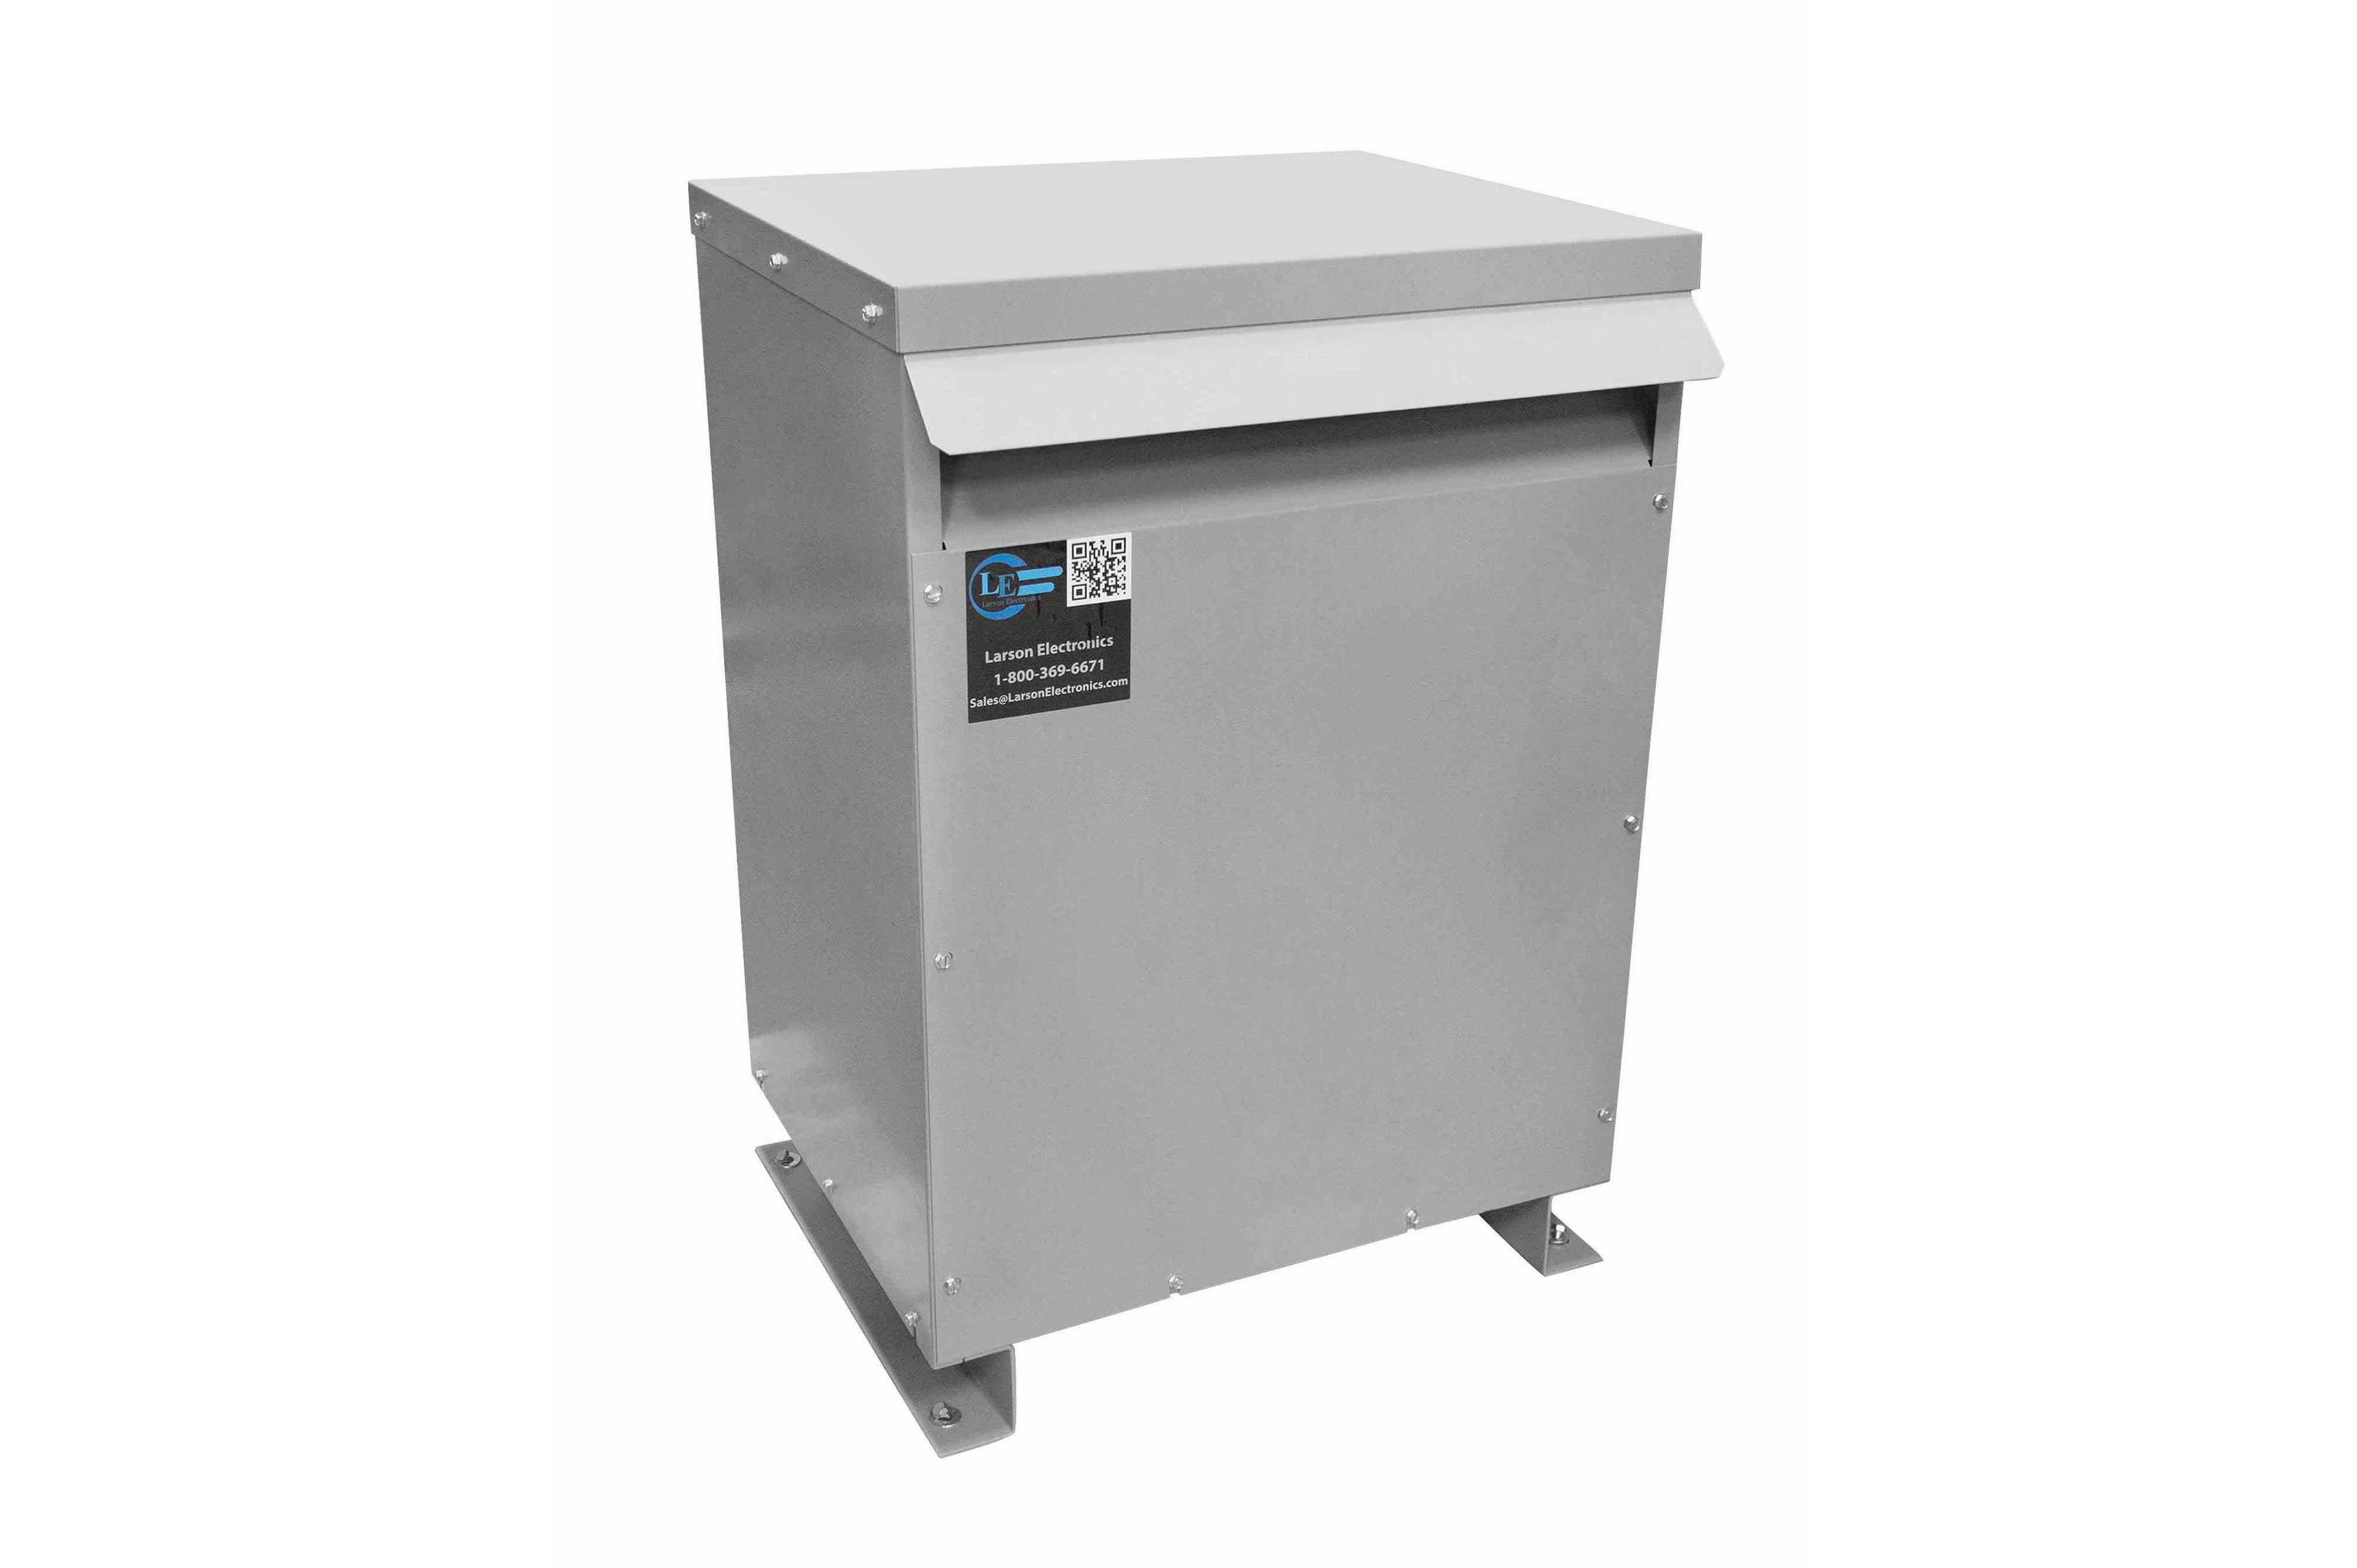 40 kVA 3PH Isolation Transformer, 460V Wye Primary, 415Y/240 Wye-N Secondary, N3R, Ventilated, 60 Hz